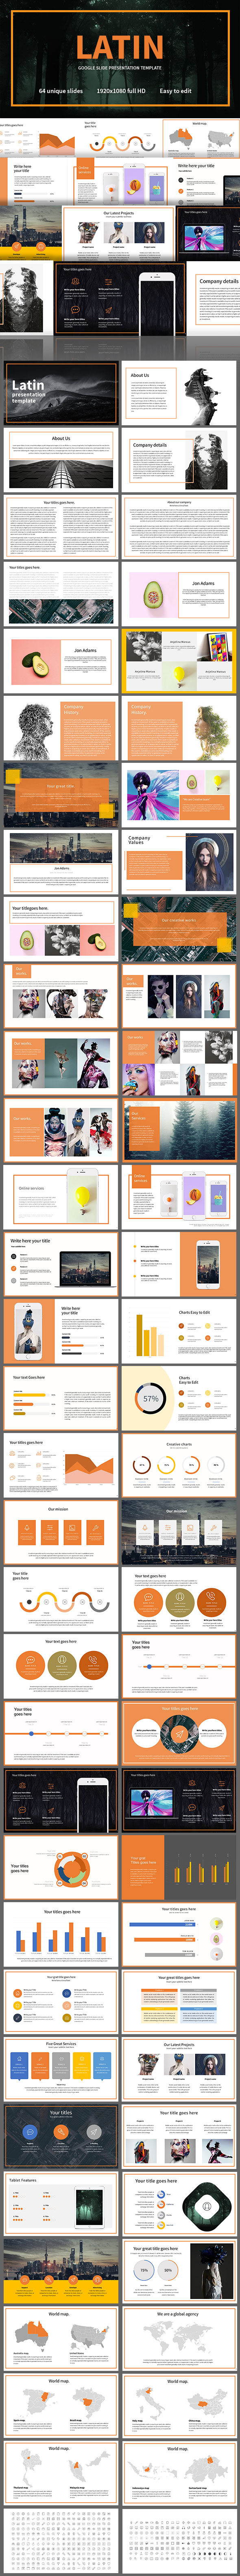 Latin Google Slides Template - Google Slides Presentation Templates